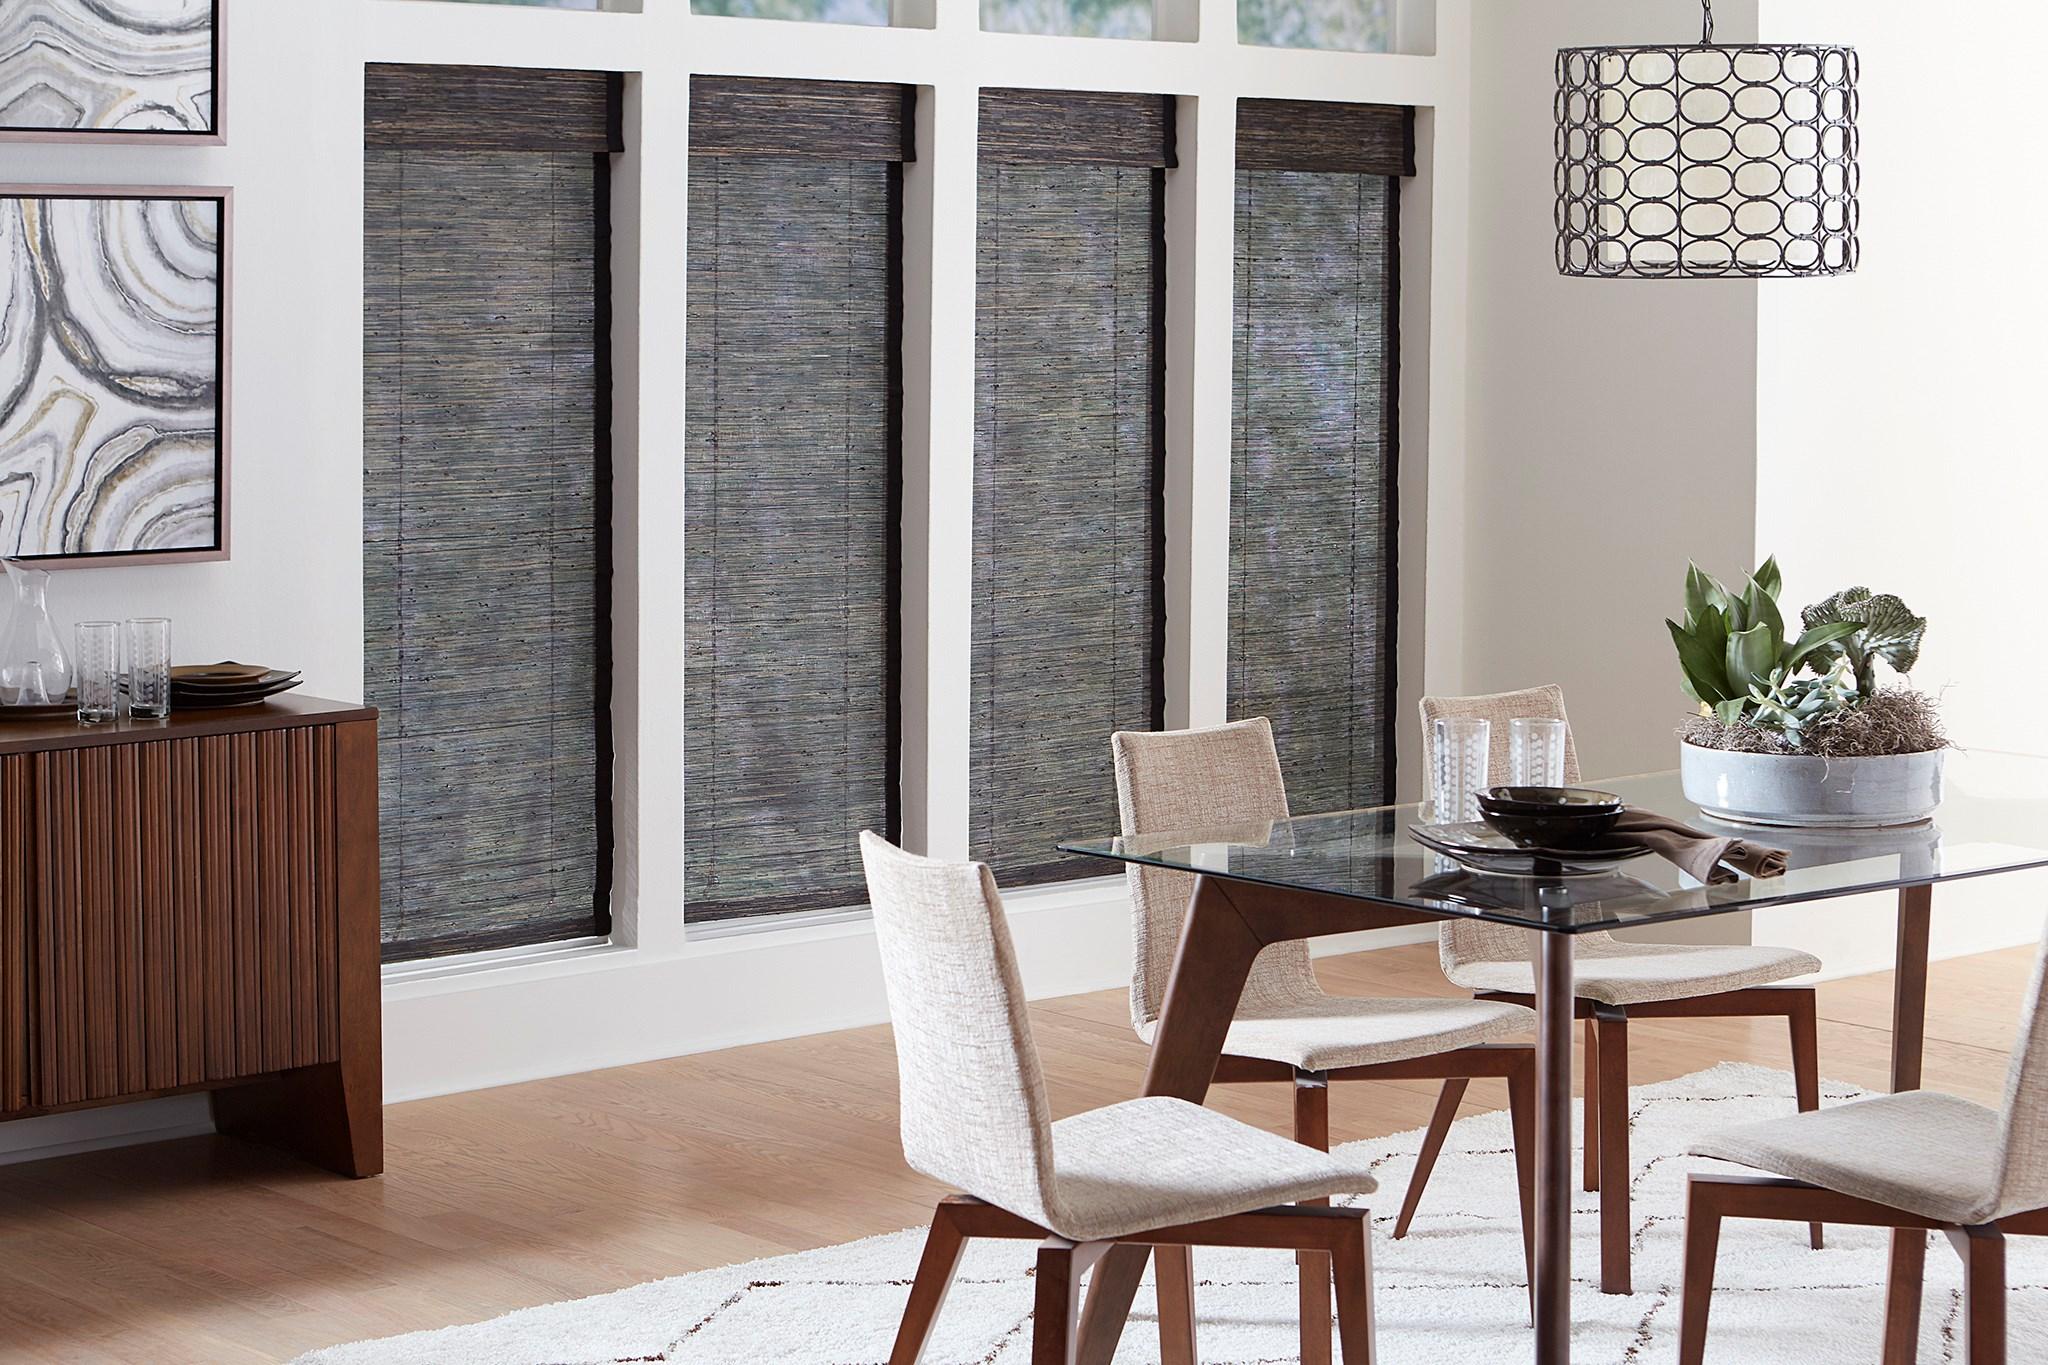 www blinds com roller shades woven wood shade blindscom budget shades